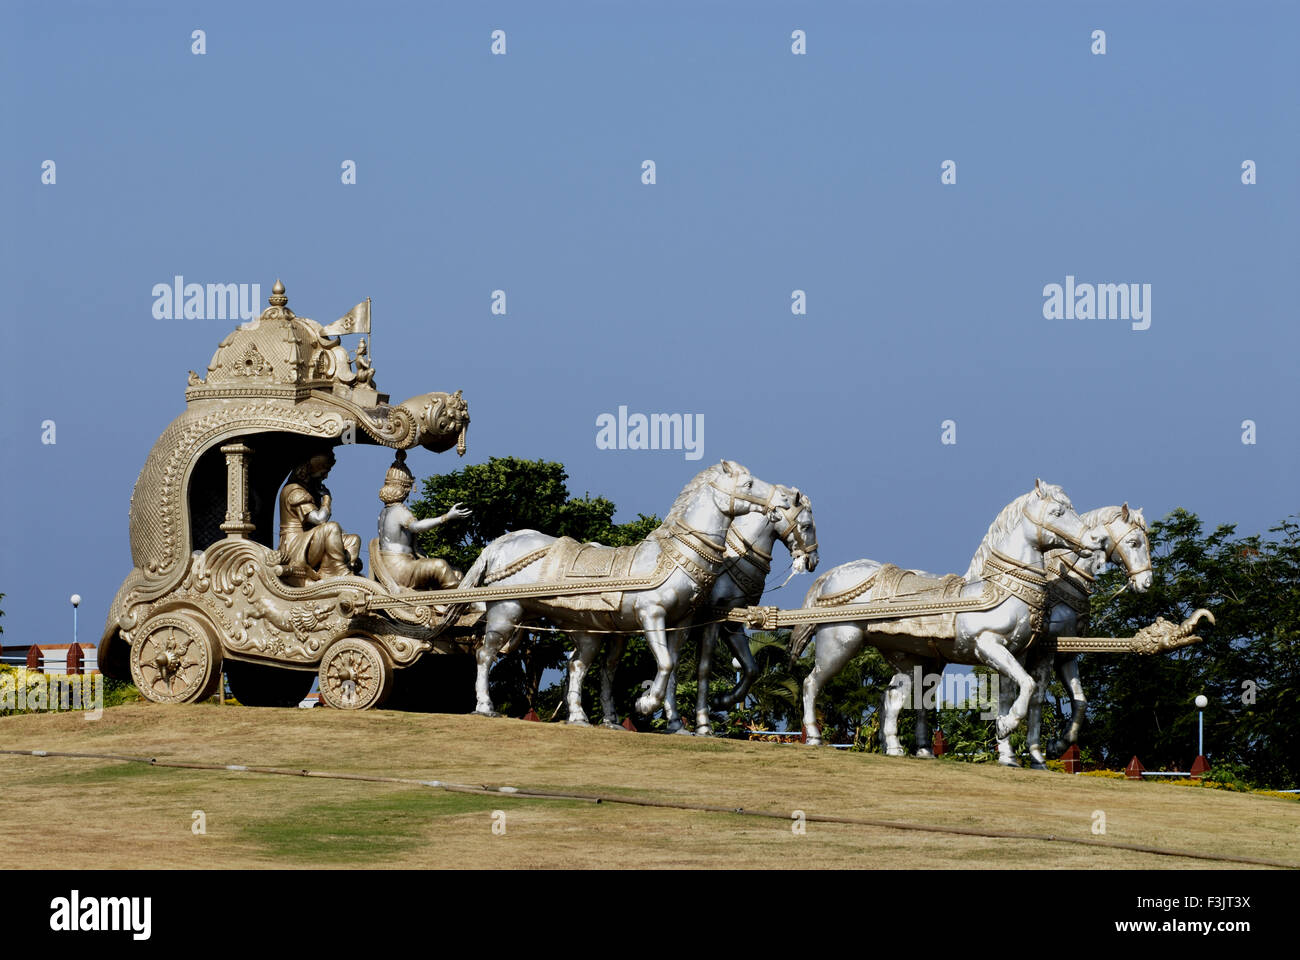 Lord Krishna Bhagavad Gita Arjuna riding horse chariot statues hillock Kandukagiri Murudeshwar Uttar Kannada karnataka - Stock Image